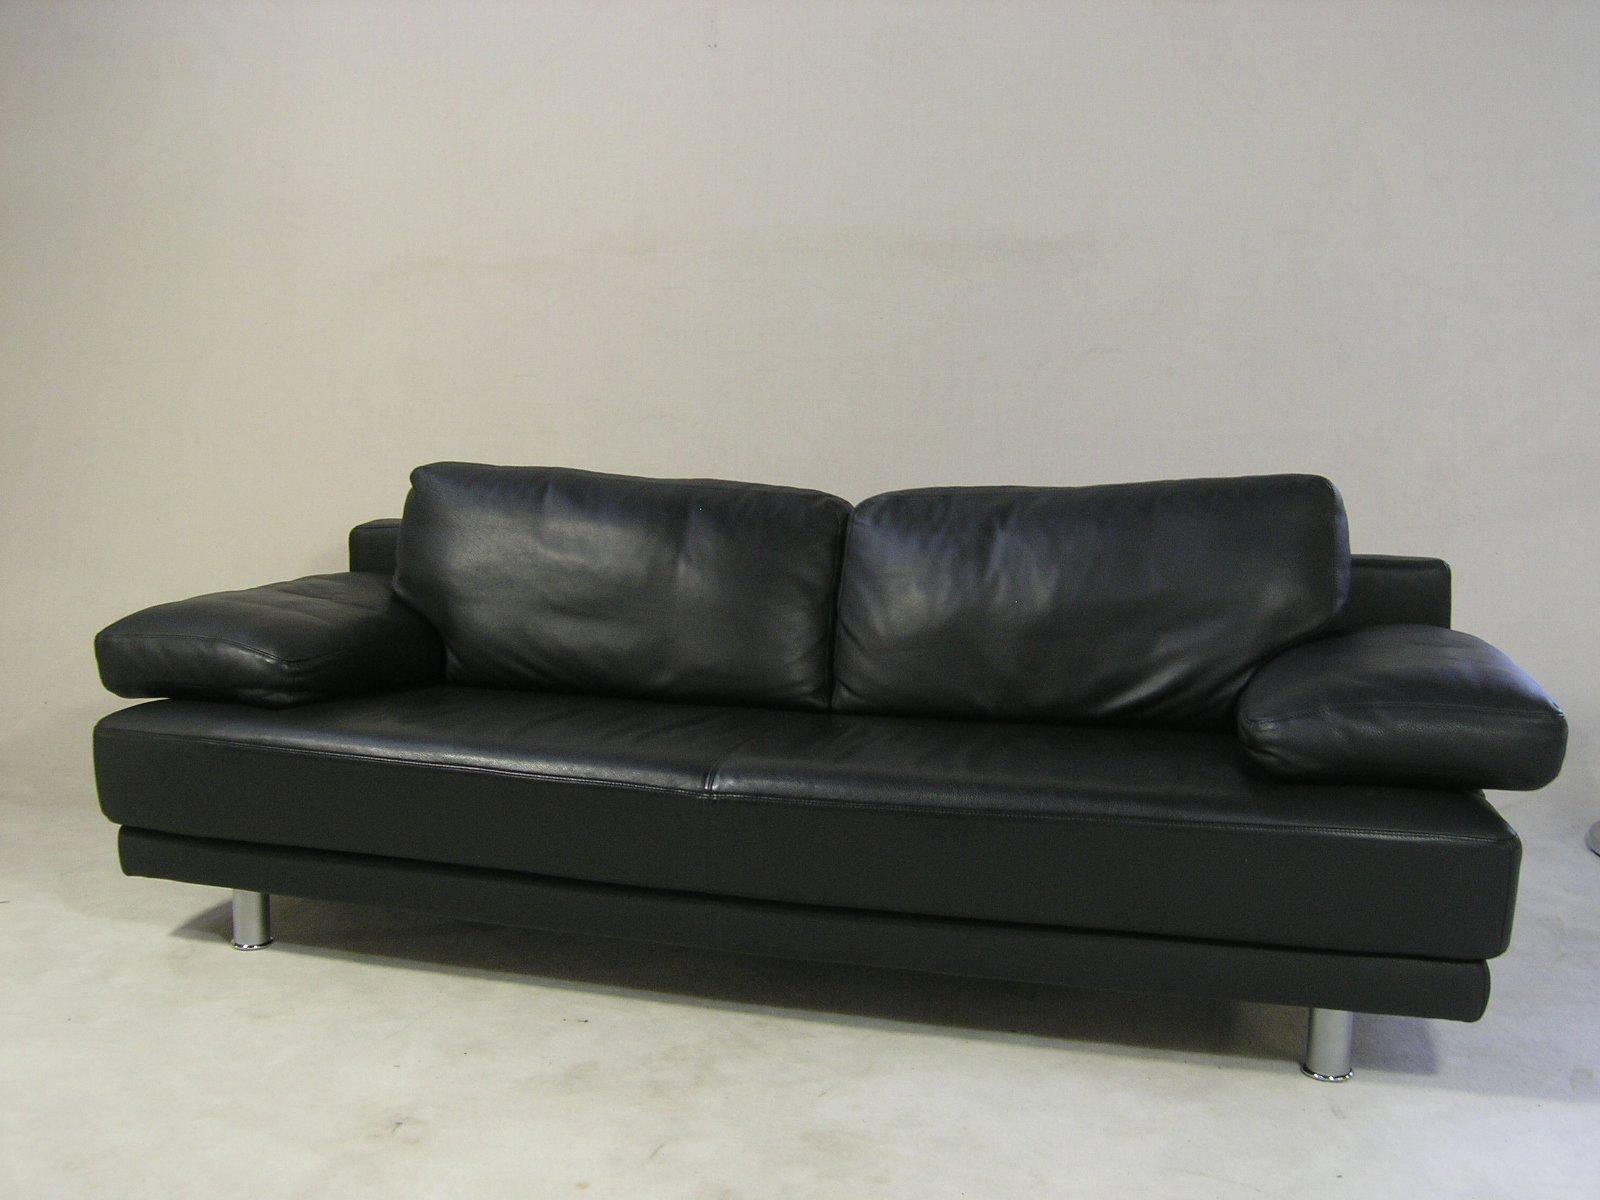 Bild rolf benz benz dono full size of rolf benz sofa leder